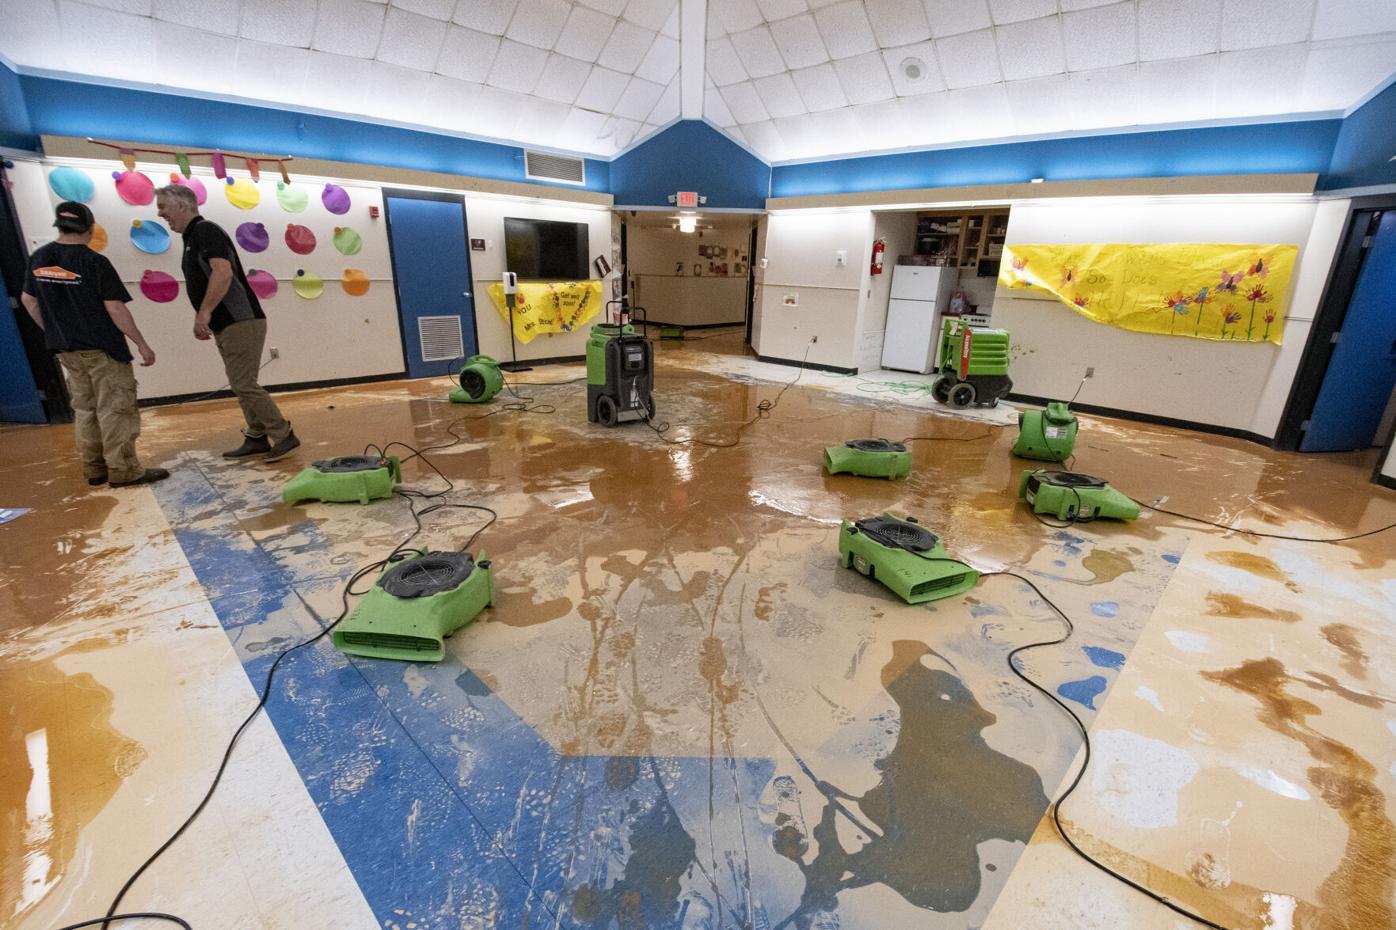 Flooding at Jim Pearson Elementary School